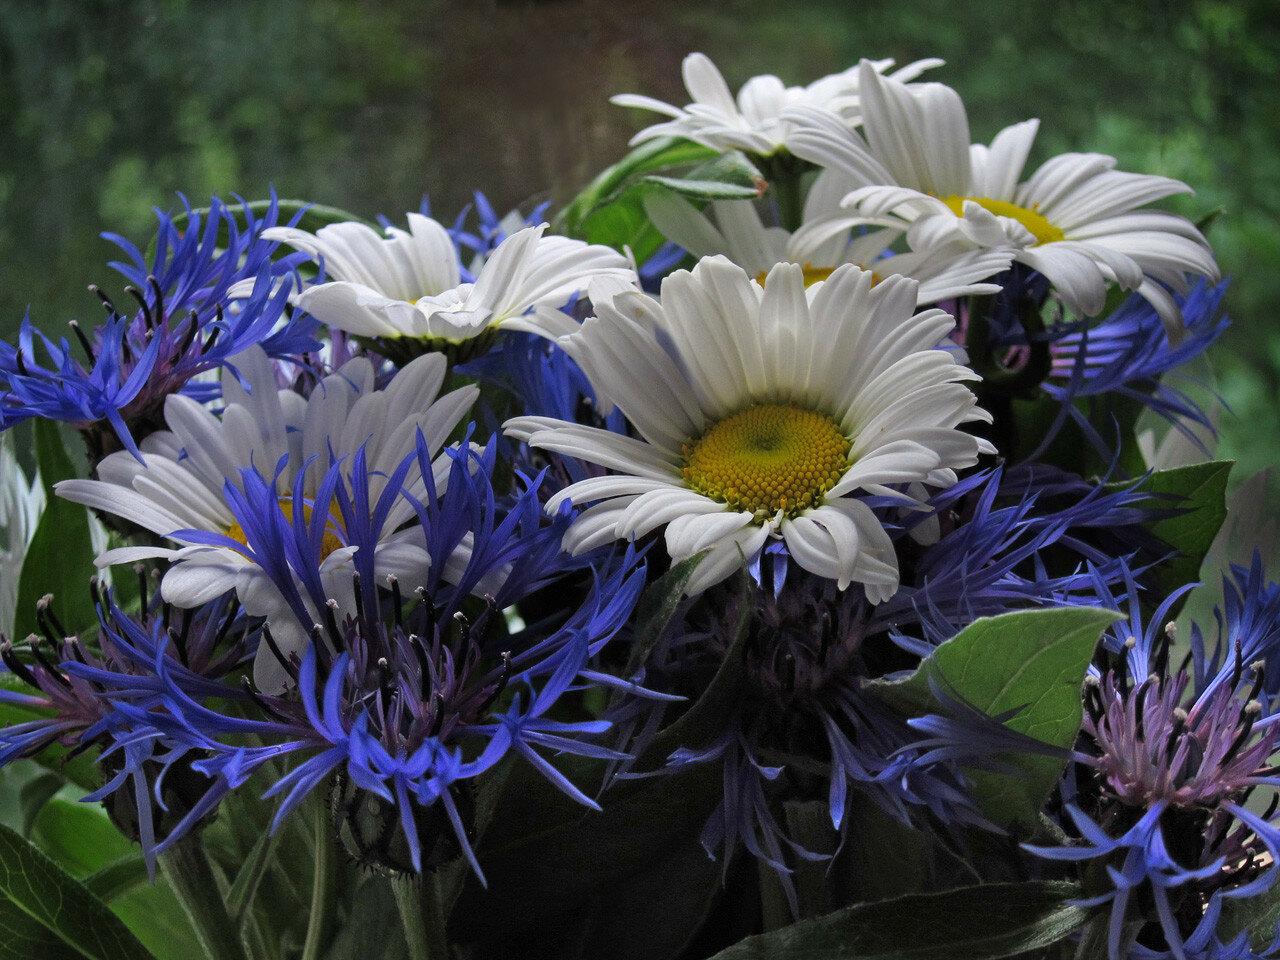 Leucanthemum_&_Centaurea_3348_js_2012.jpg